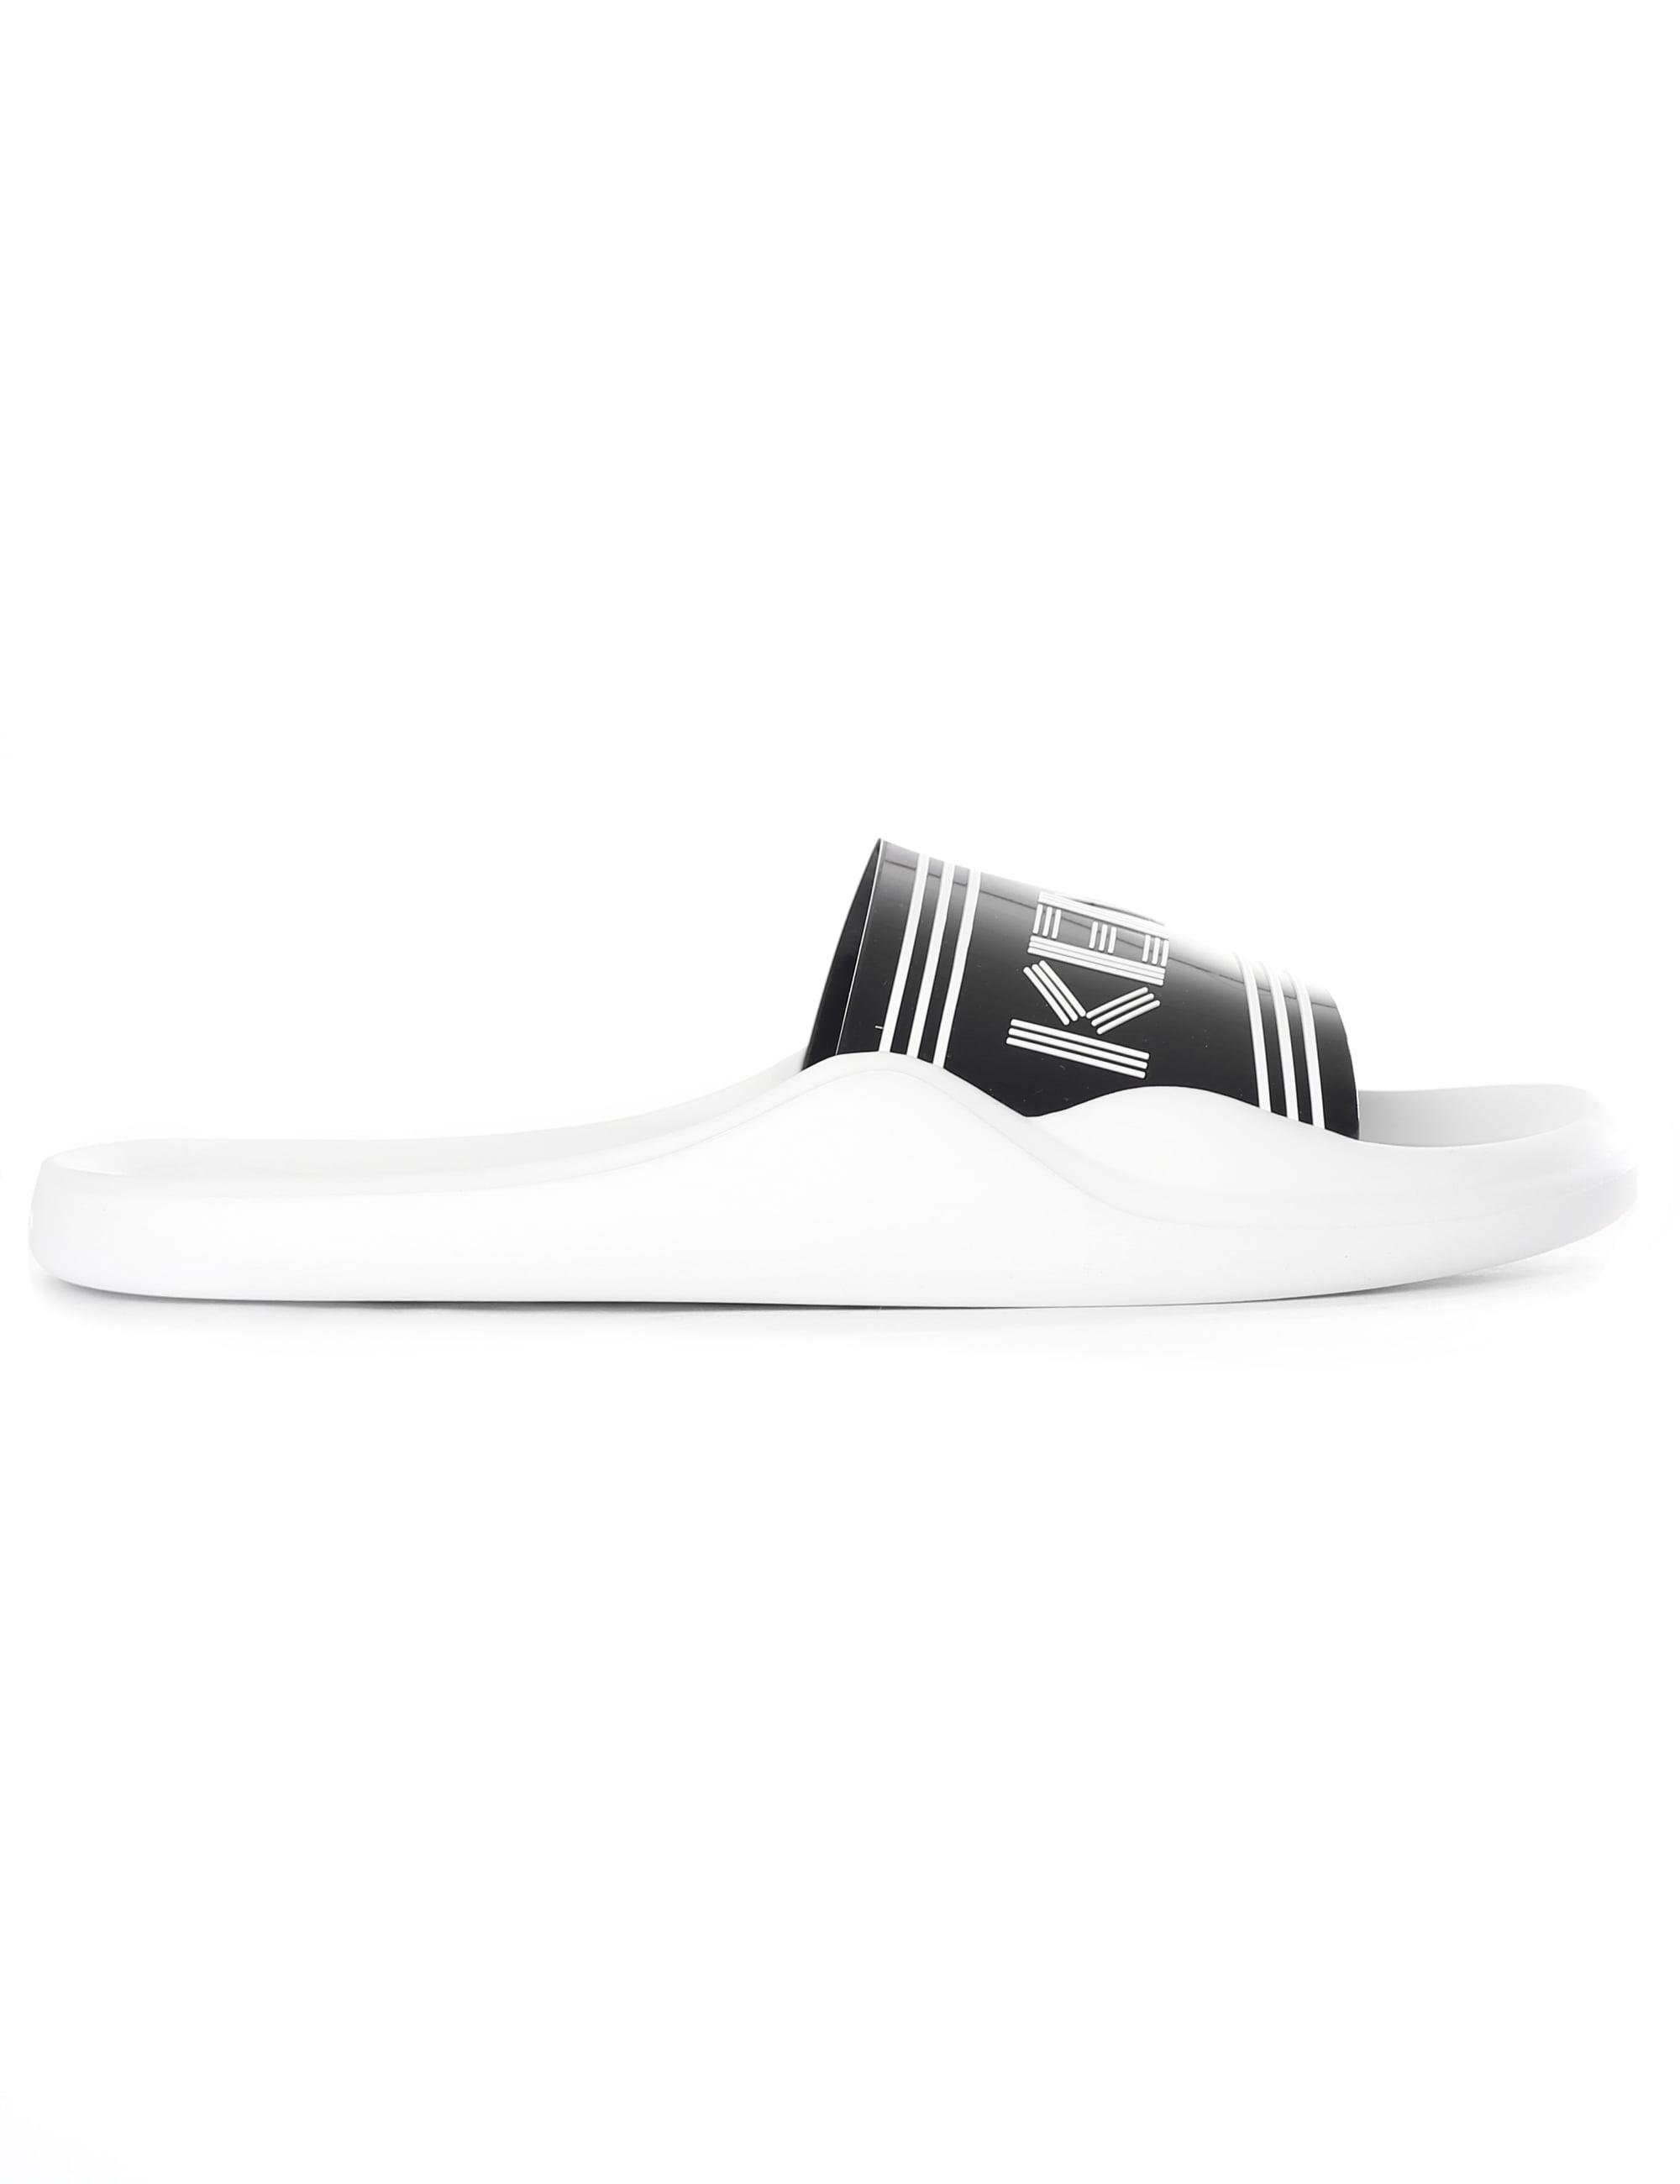 acb77db9dc560 KENZO - Black Sandals for Men - Lyst. View fullscreen